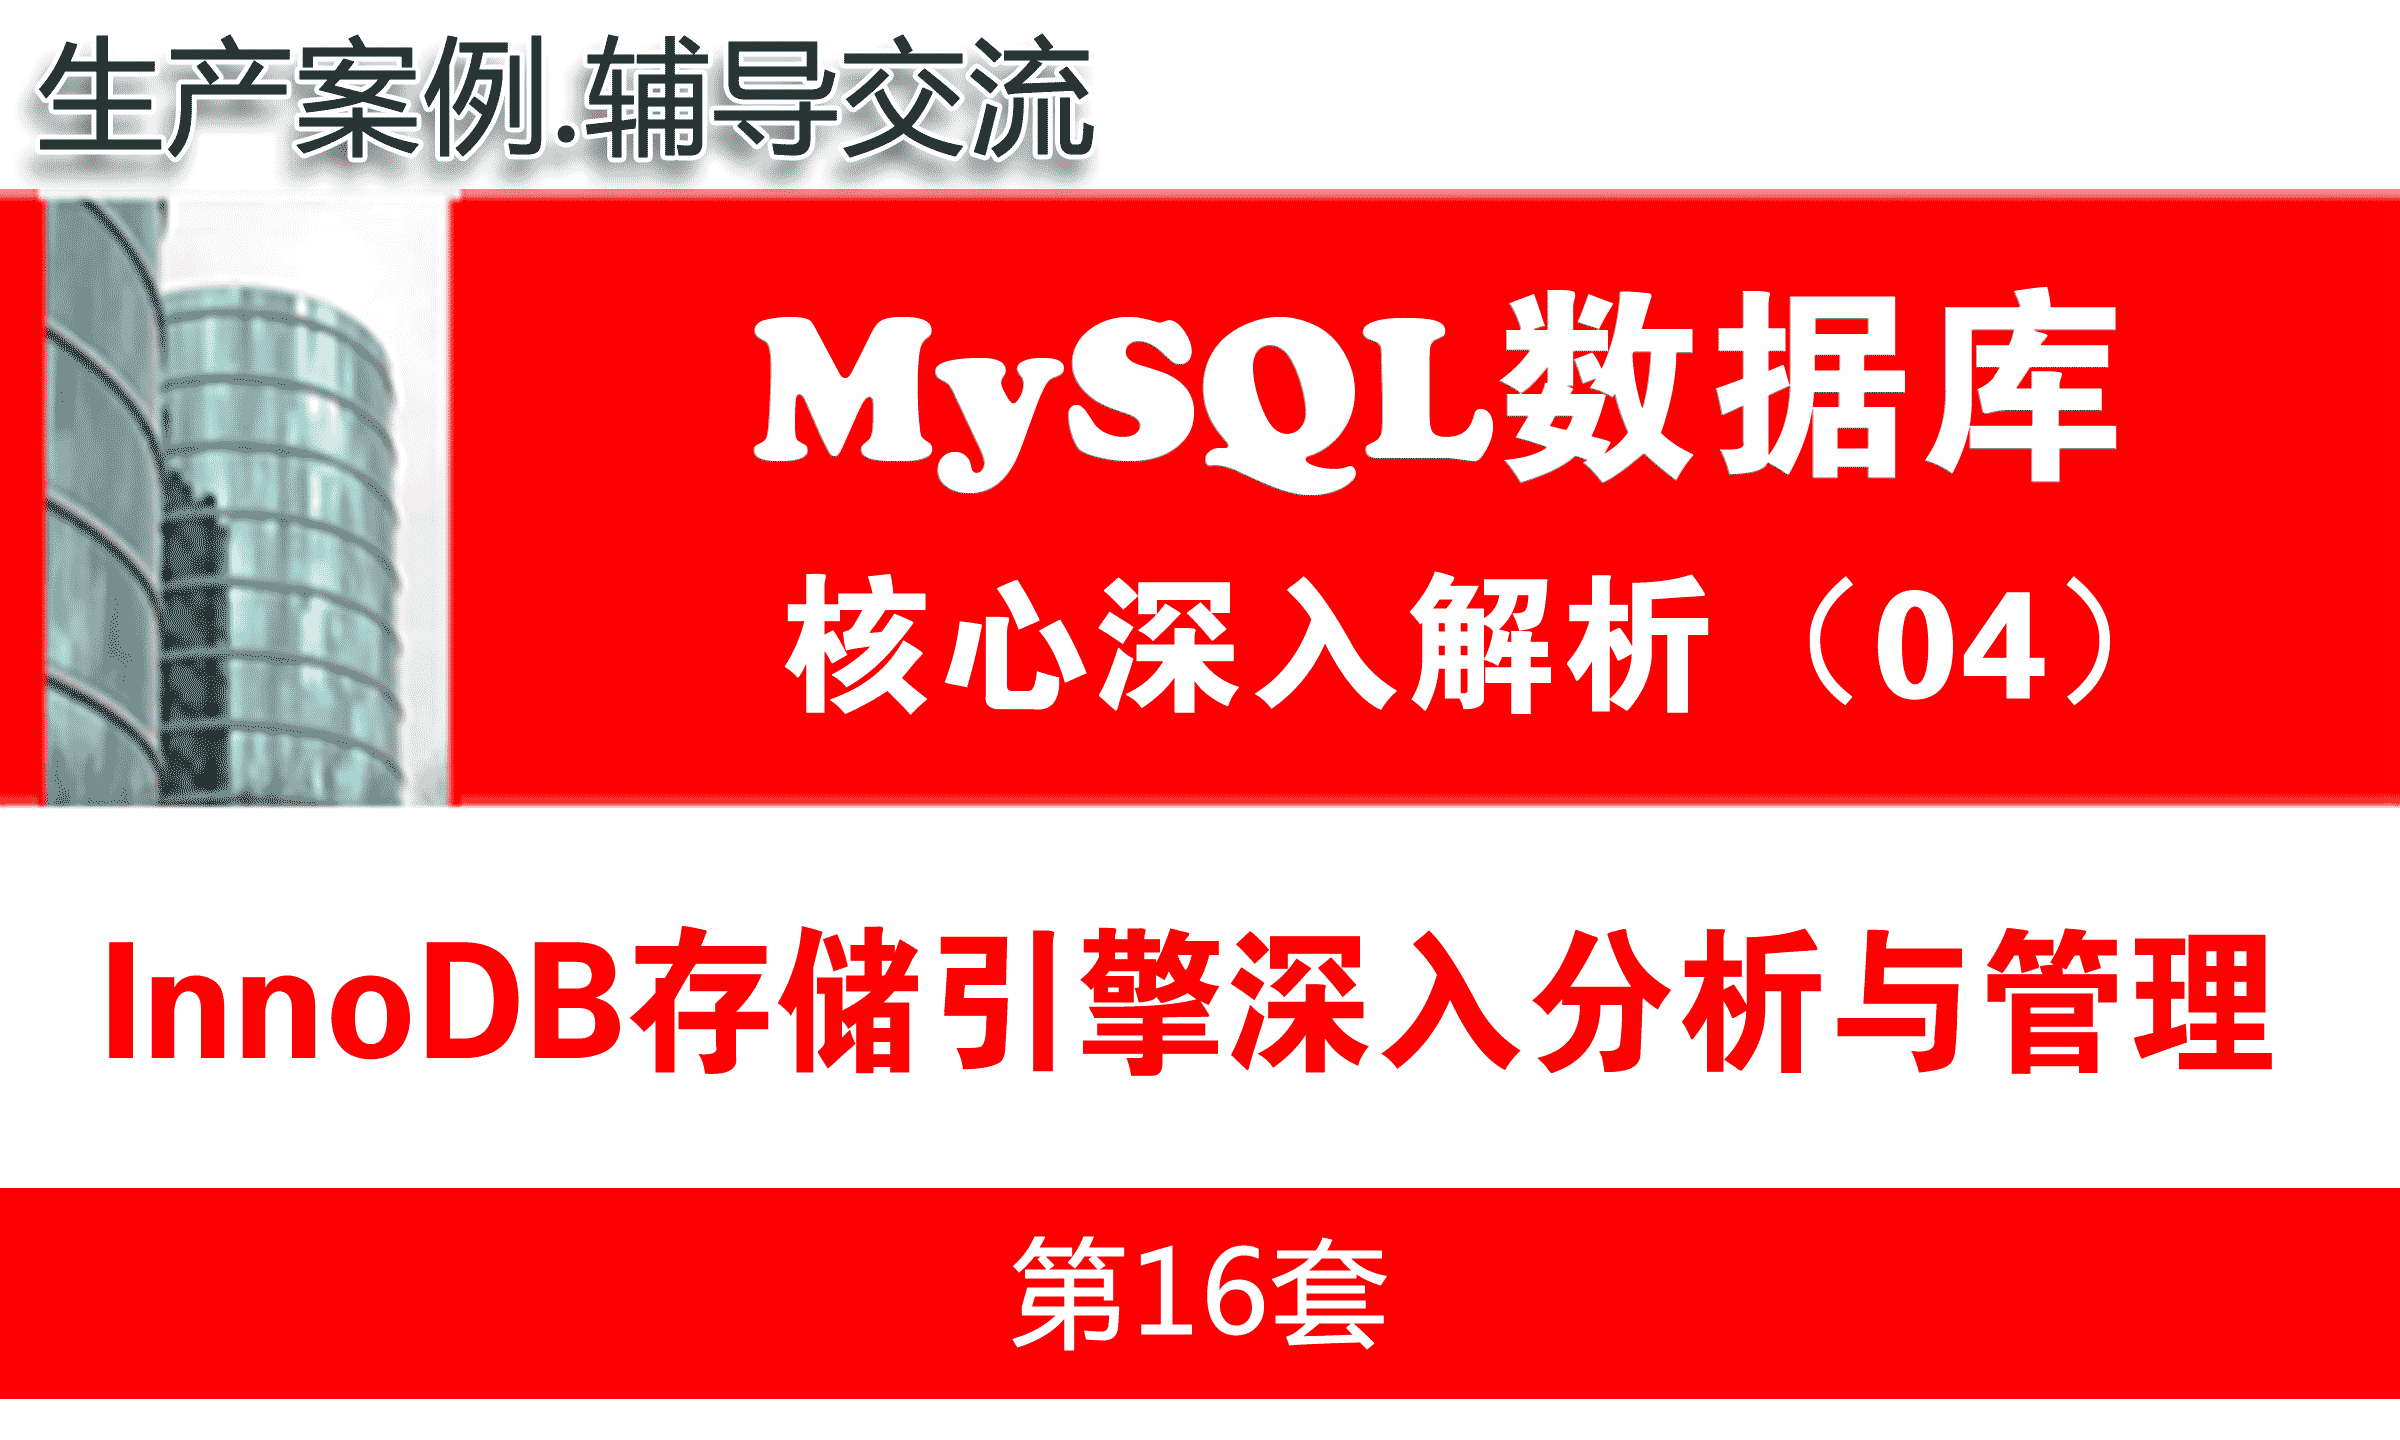 MySQL InnoDB存储引擎深入分析与管理_MySQL数据库基础深入与核心解析04